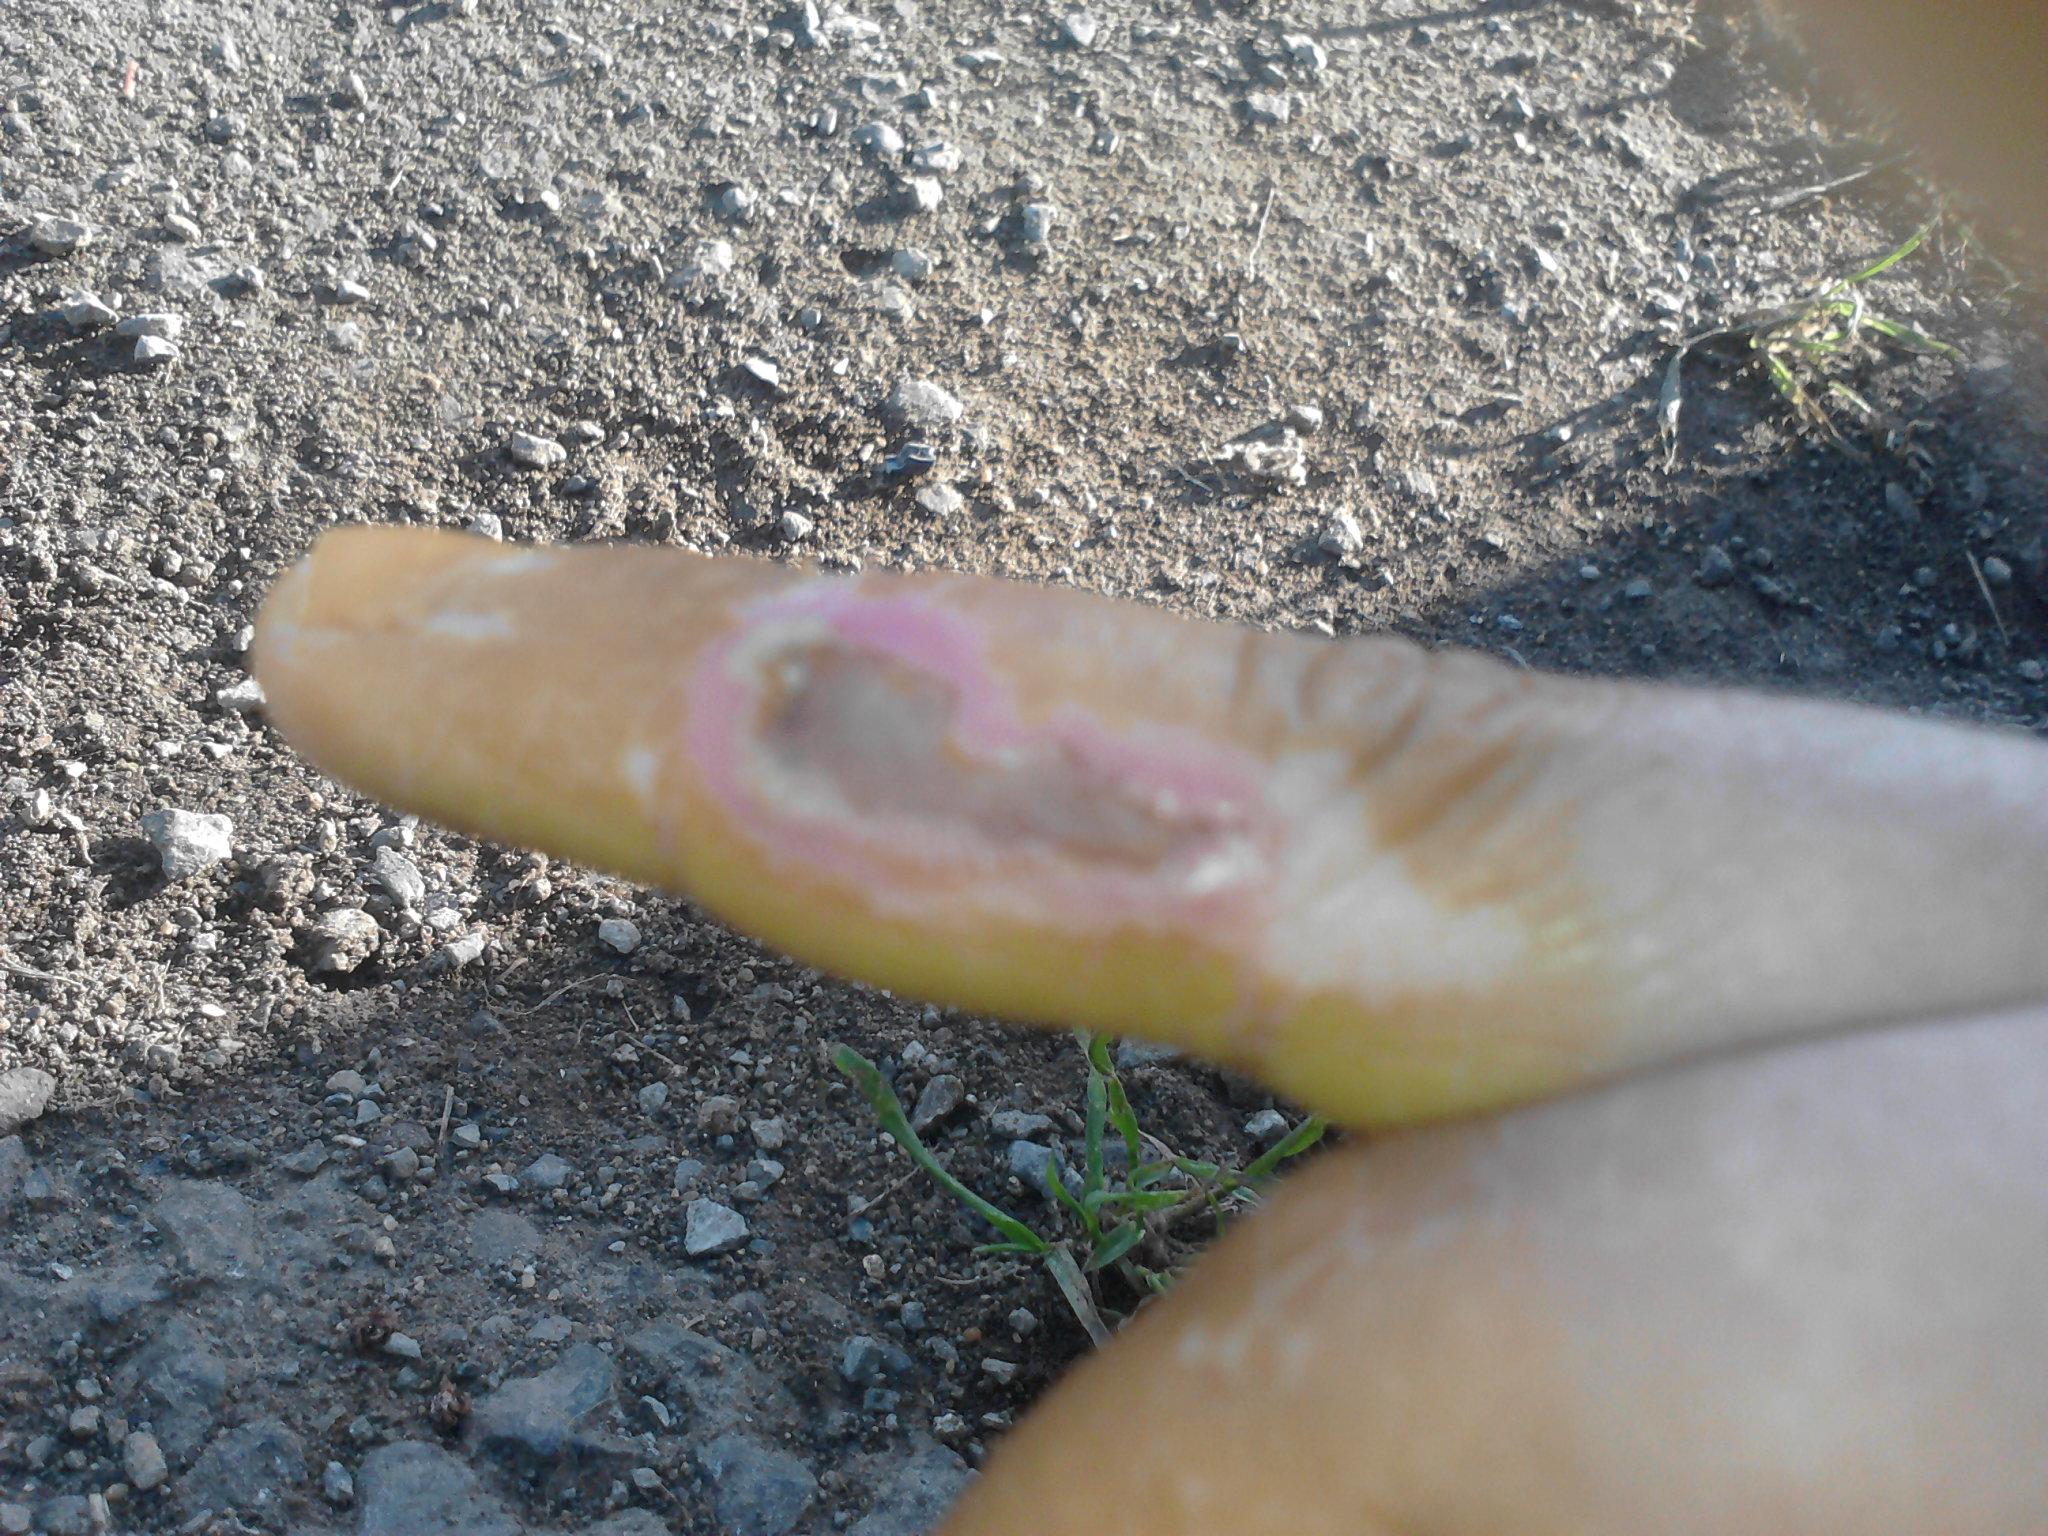 hydrochloric acid burn hand wwwpixsharkcom images